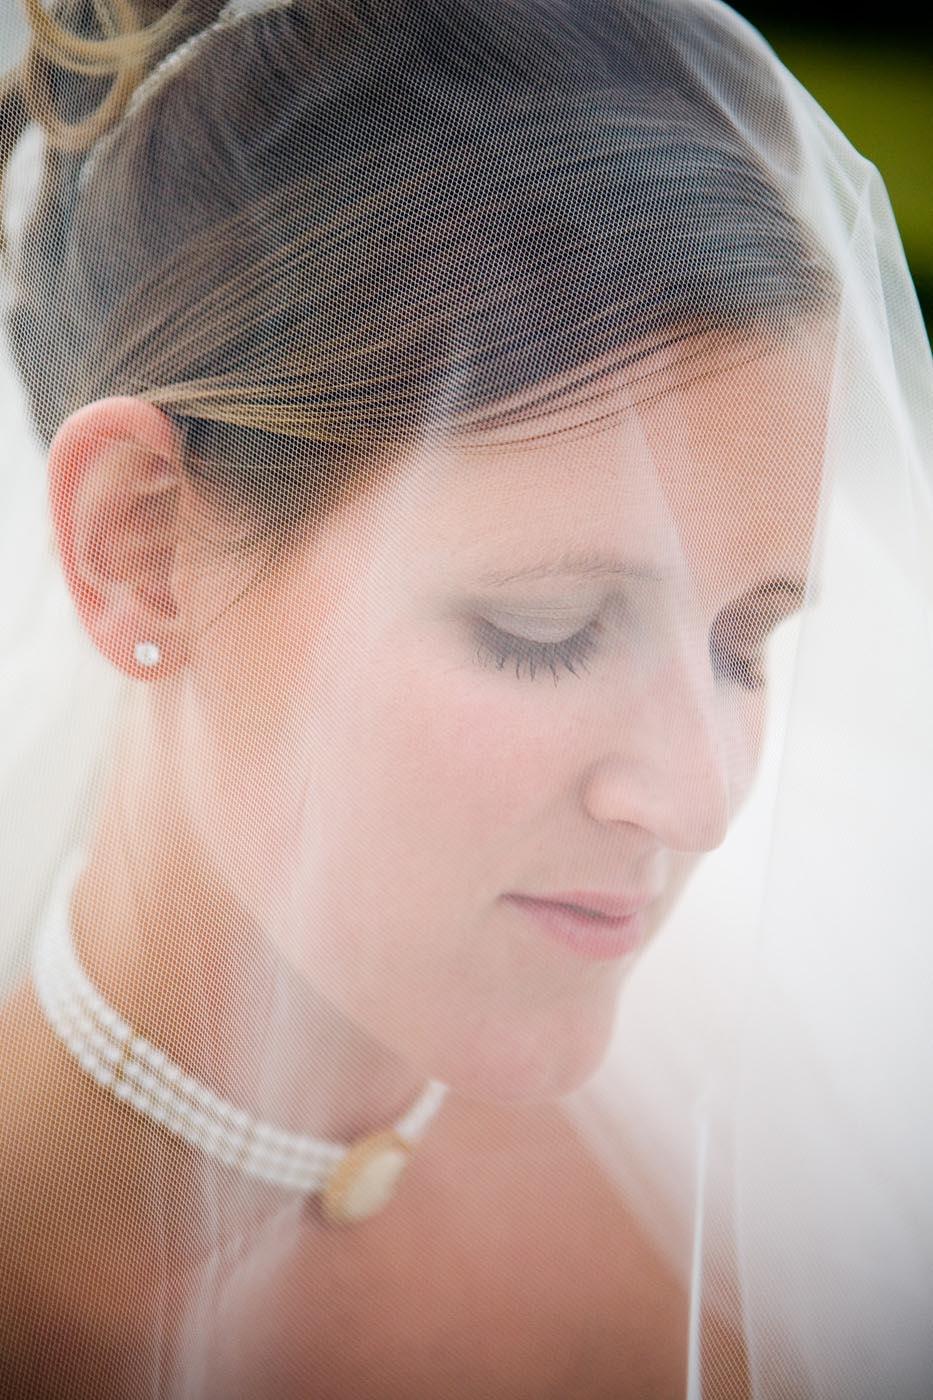 dan_burman_wedding_photography (9).jpg